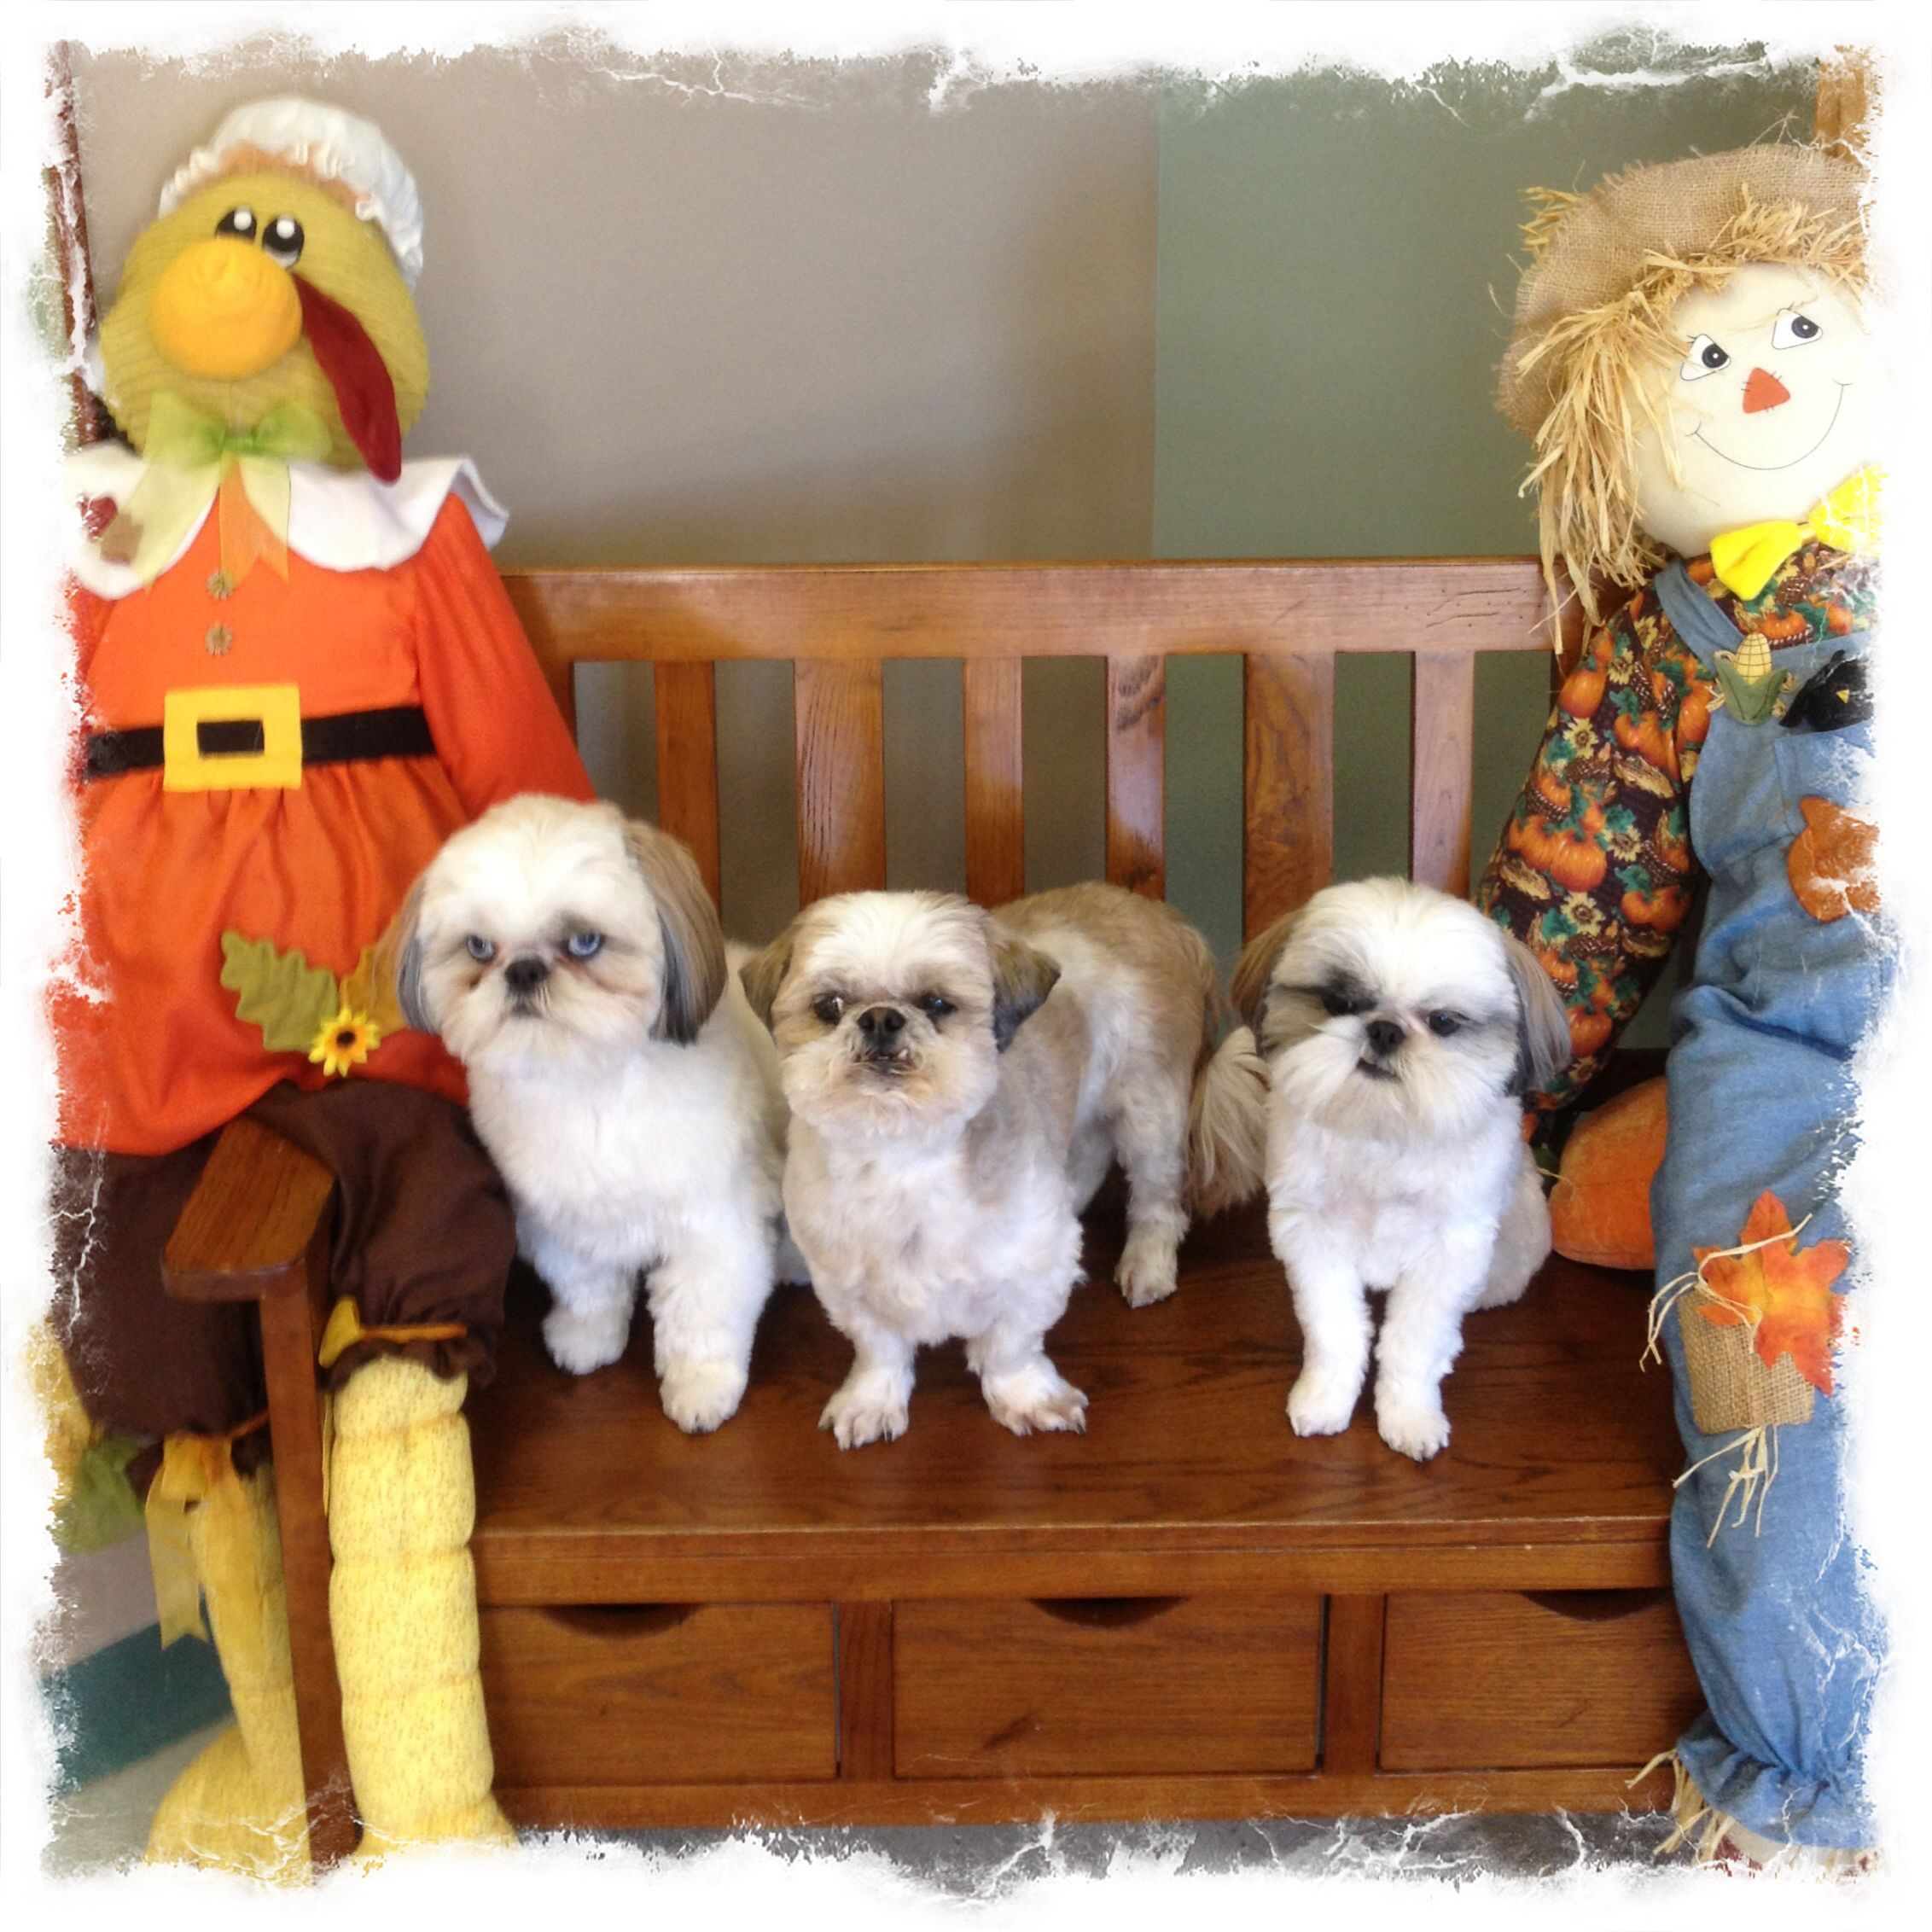 #autumnatallkreatures #shihtzu #dogboarding Bo, Murphy and Lola